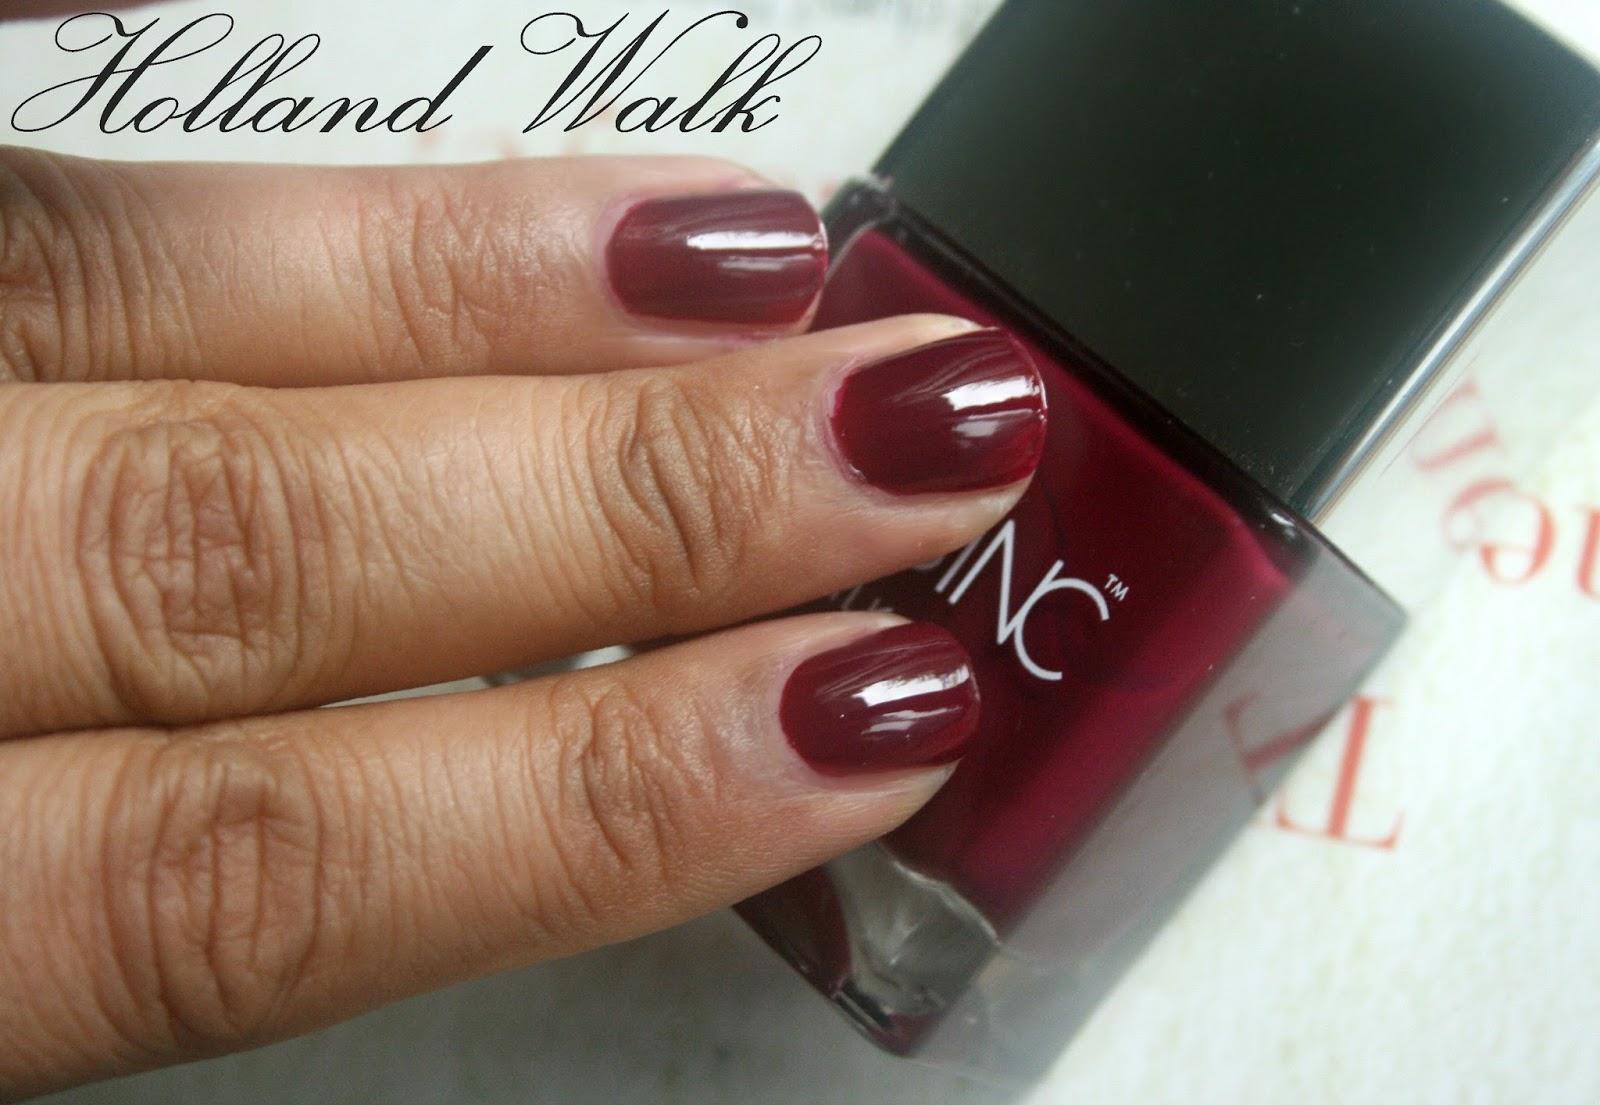 Nails Inc. Nailkale Holland Walk Review, Photos & Swatches